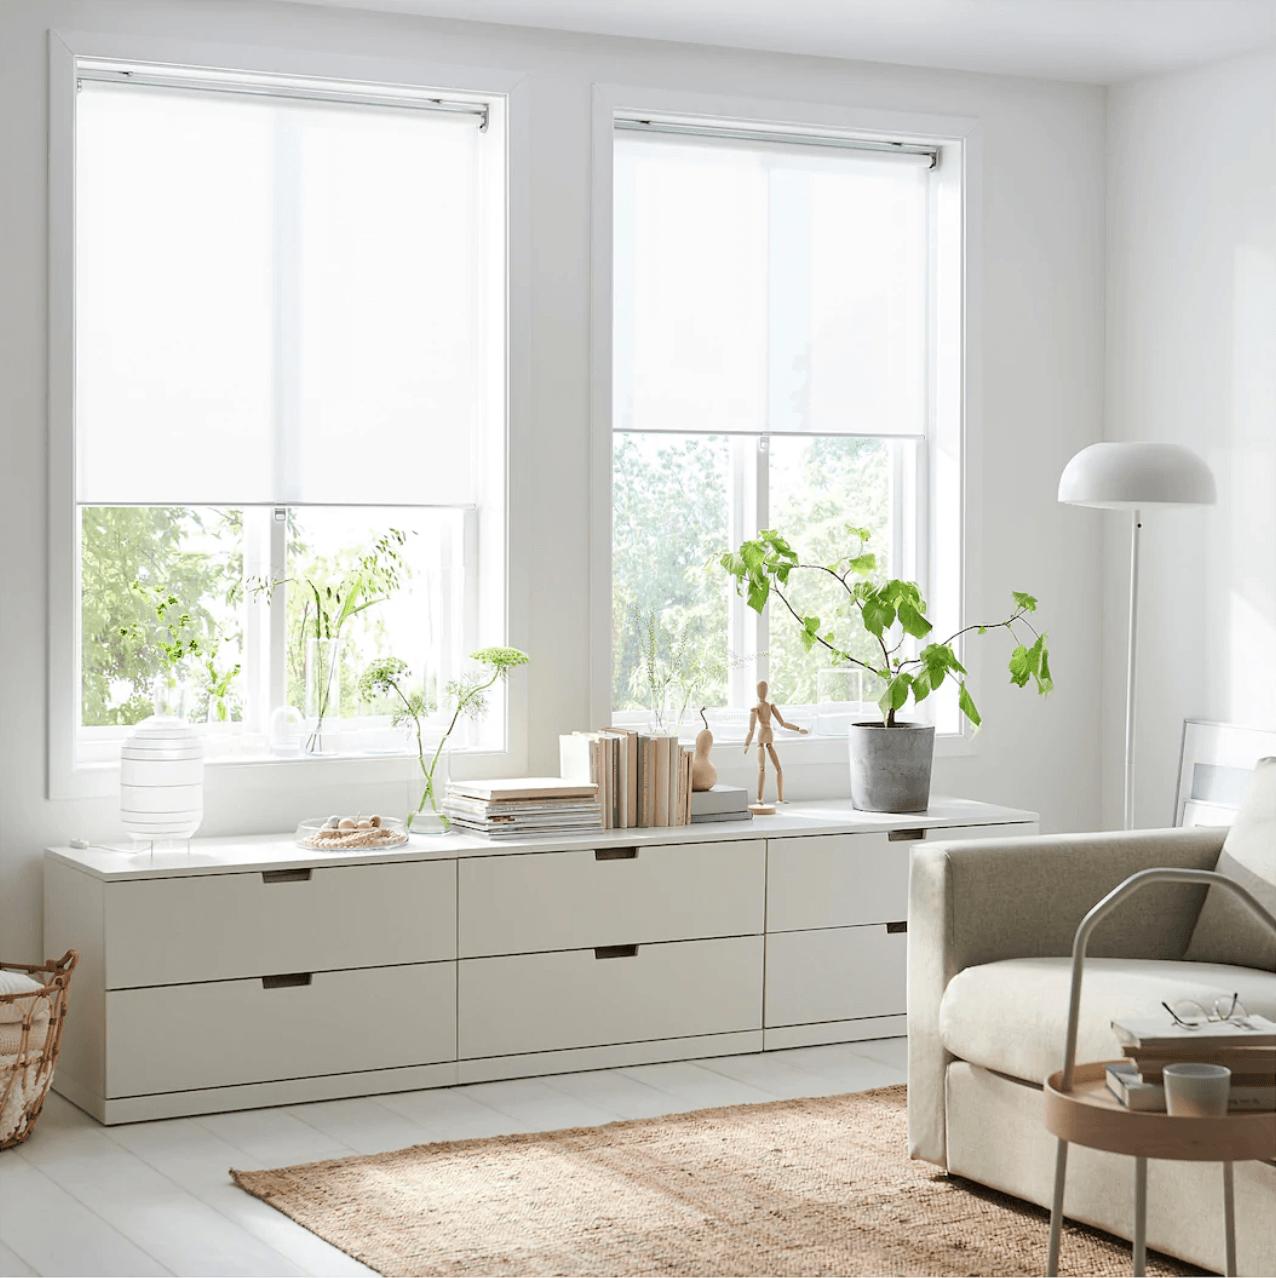 Ikea&#8